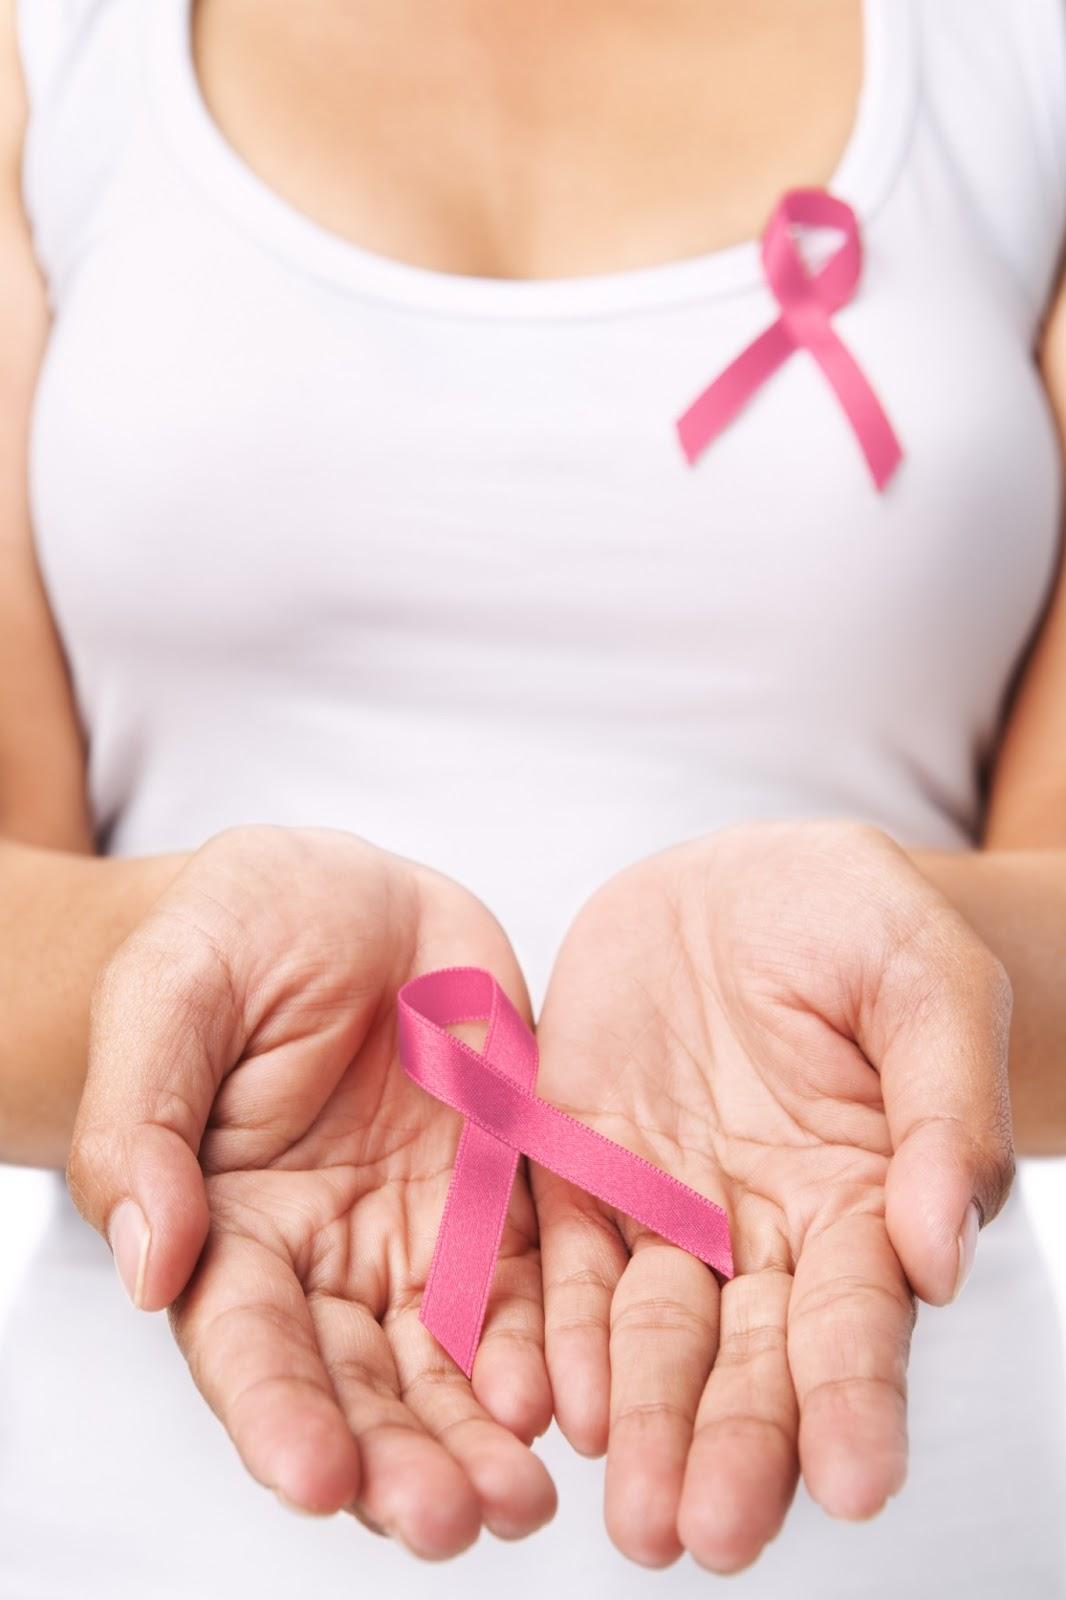 https://3.bp.blogspot.com/-Y76GuSMsmpg/WKLTYX-Ej0I/AAAAAAAAAjk/ZBIyJkH1qOUDUcxWXmJOIYDSj8aPxzoGwCLcB/s1600/kanker-payudara%2Basli.jpg